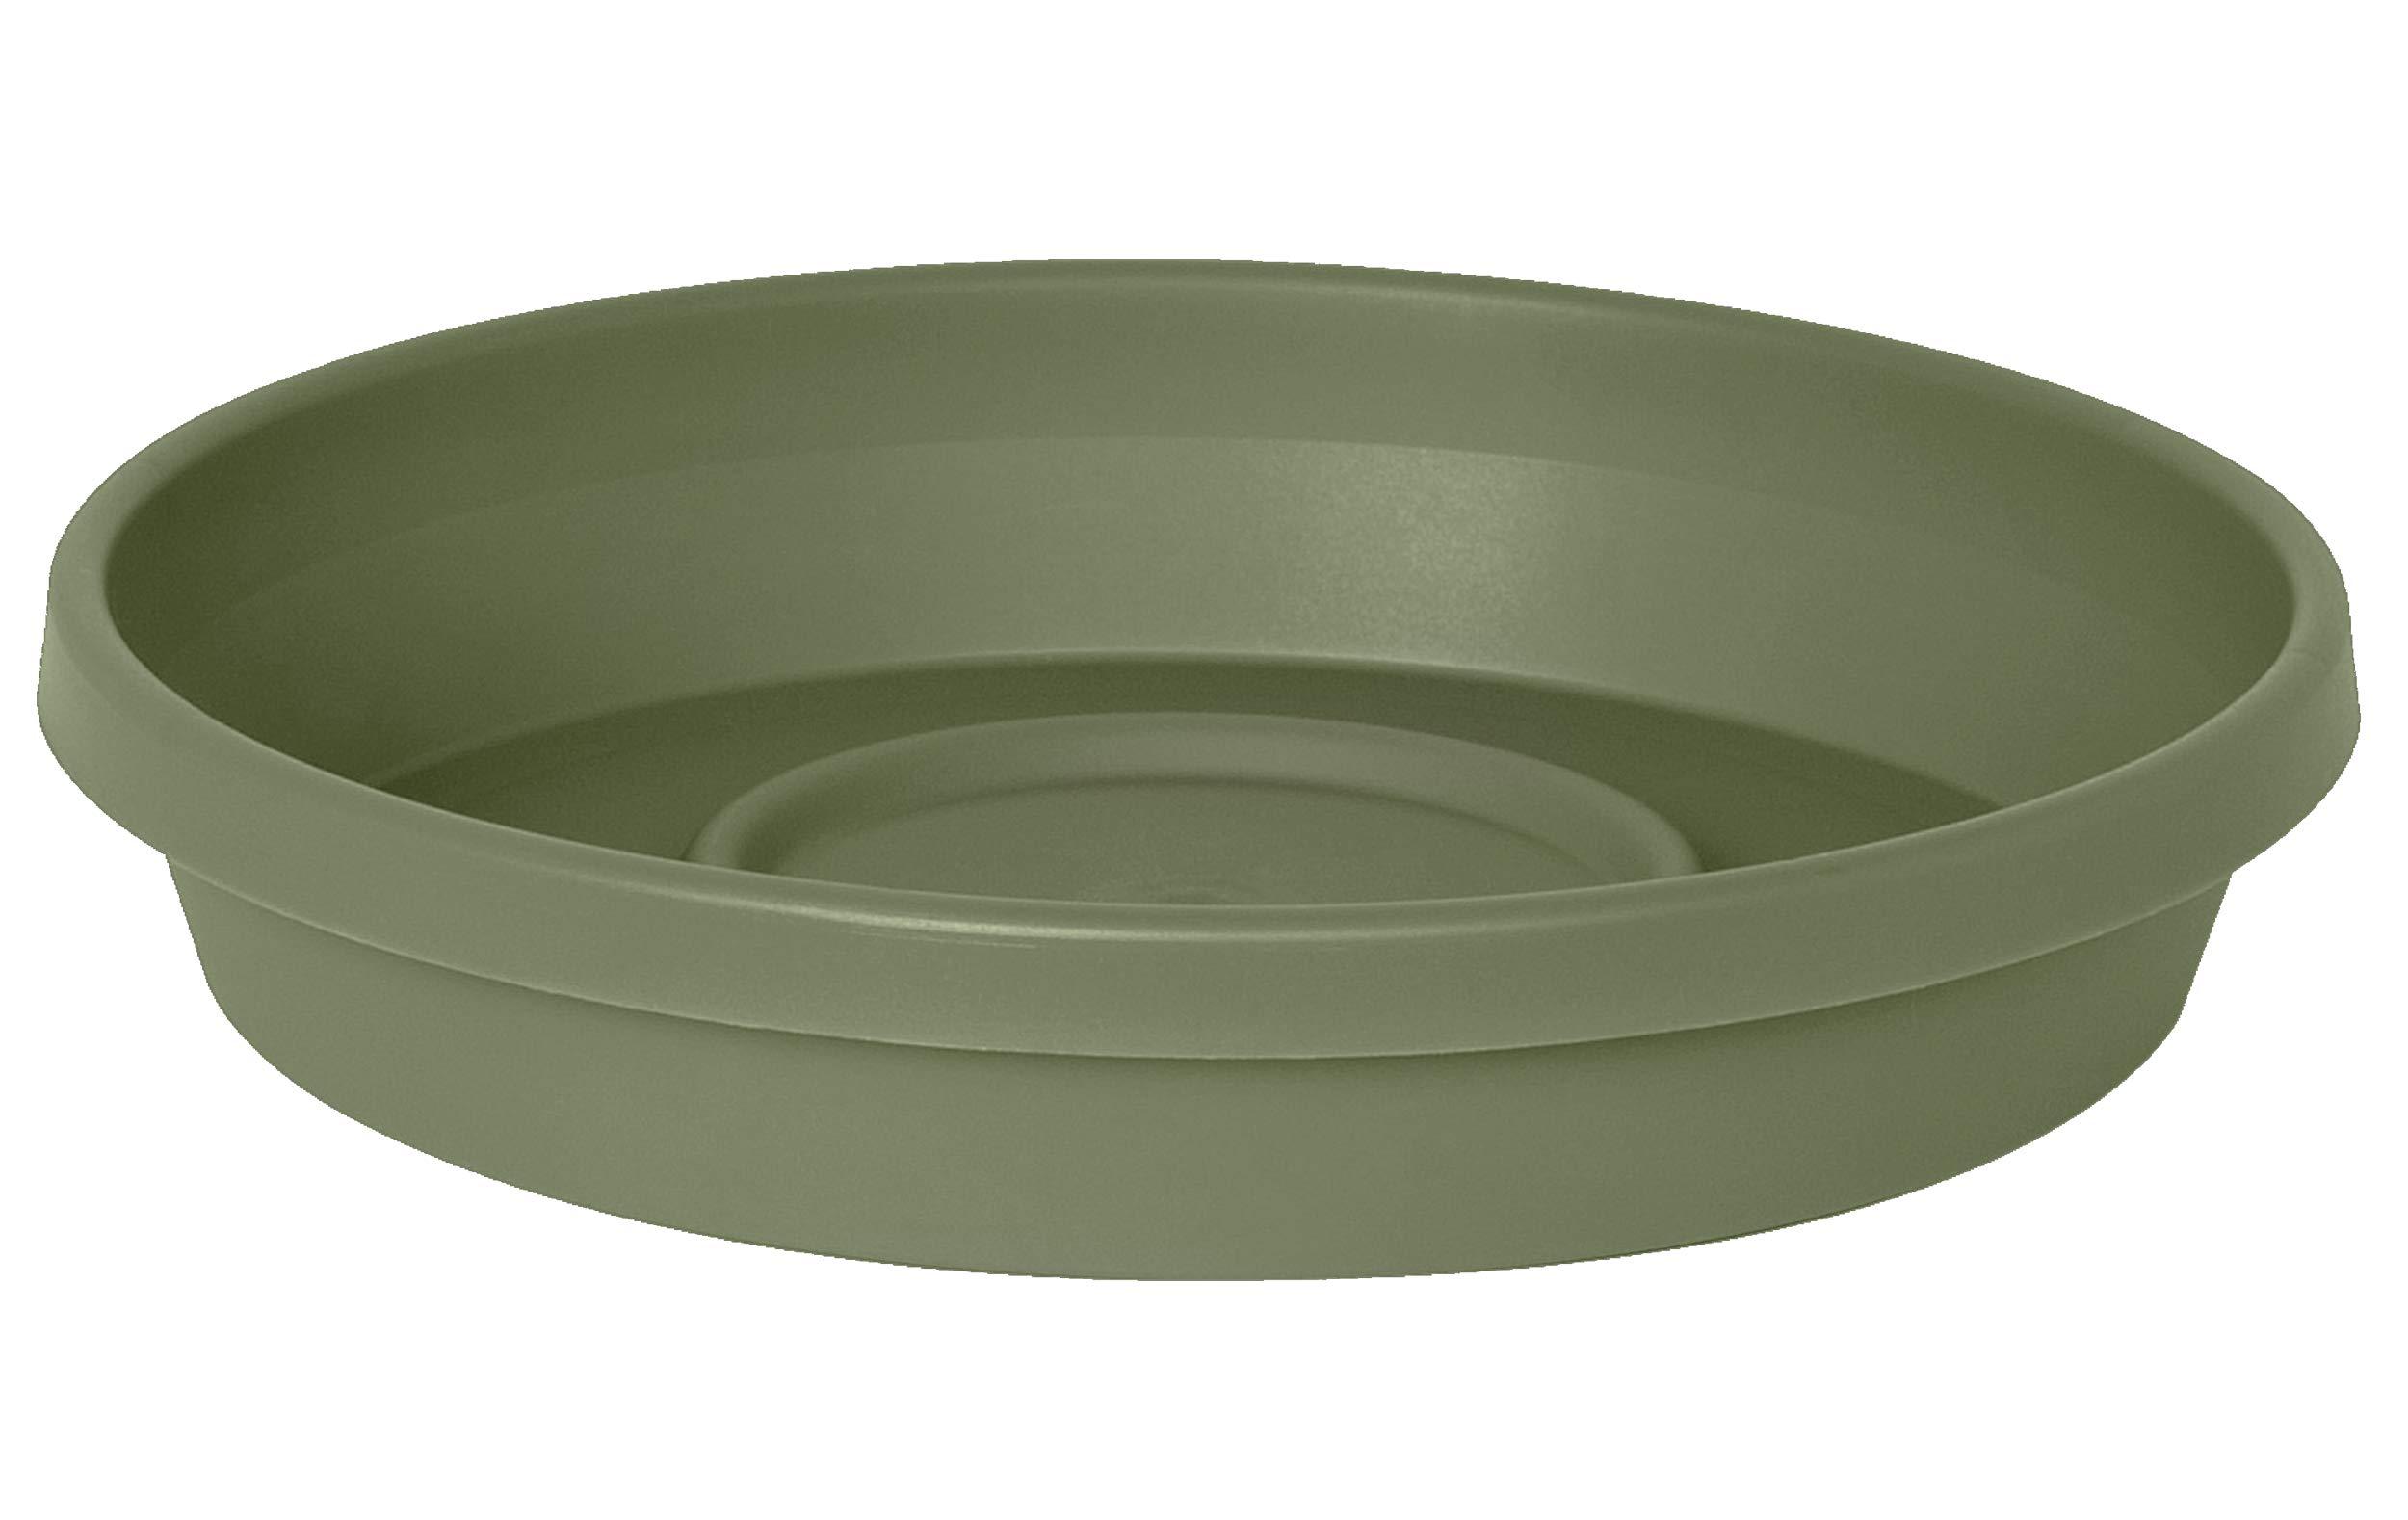 "Bloem Terra Plant Saucer Tray 15"" Living Green"